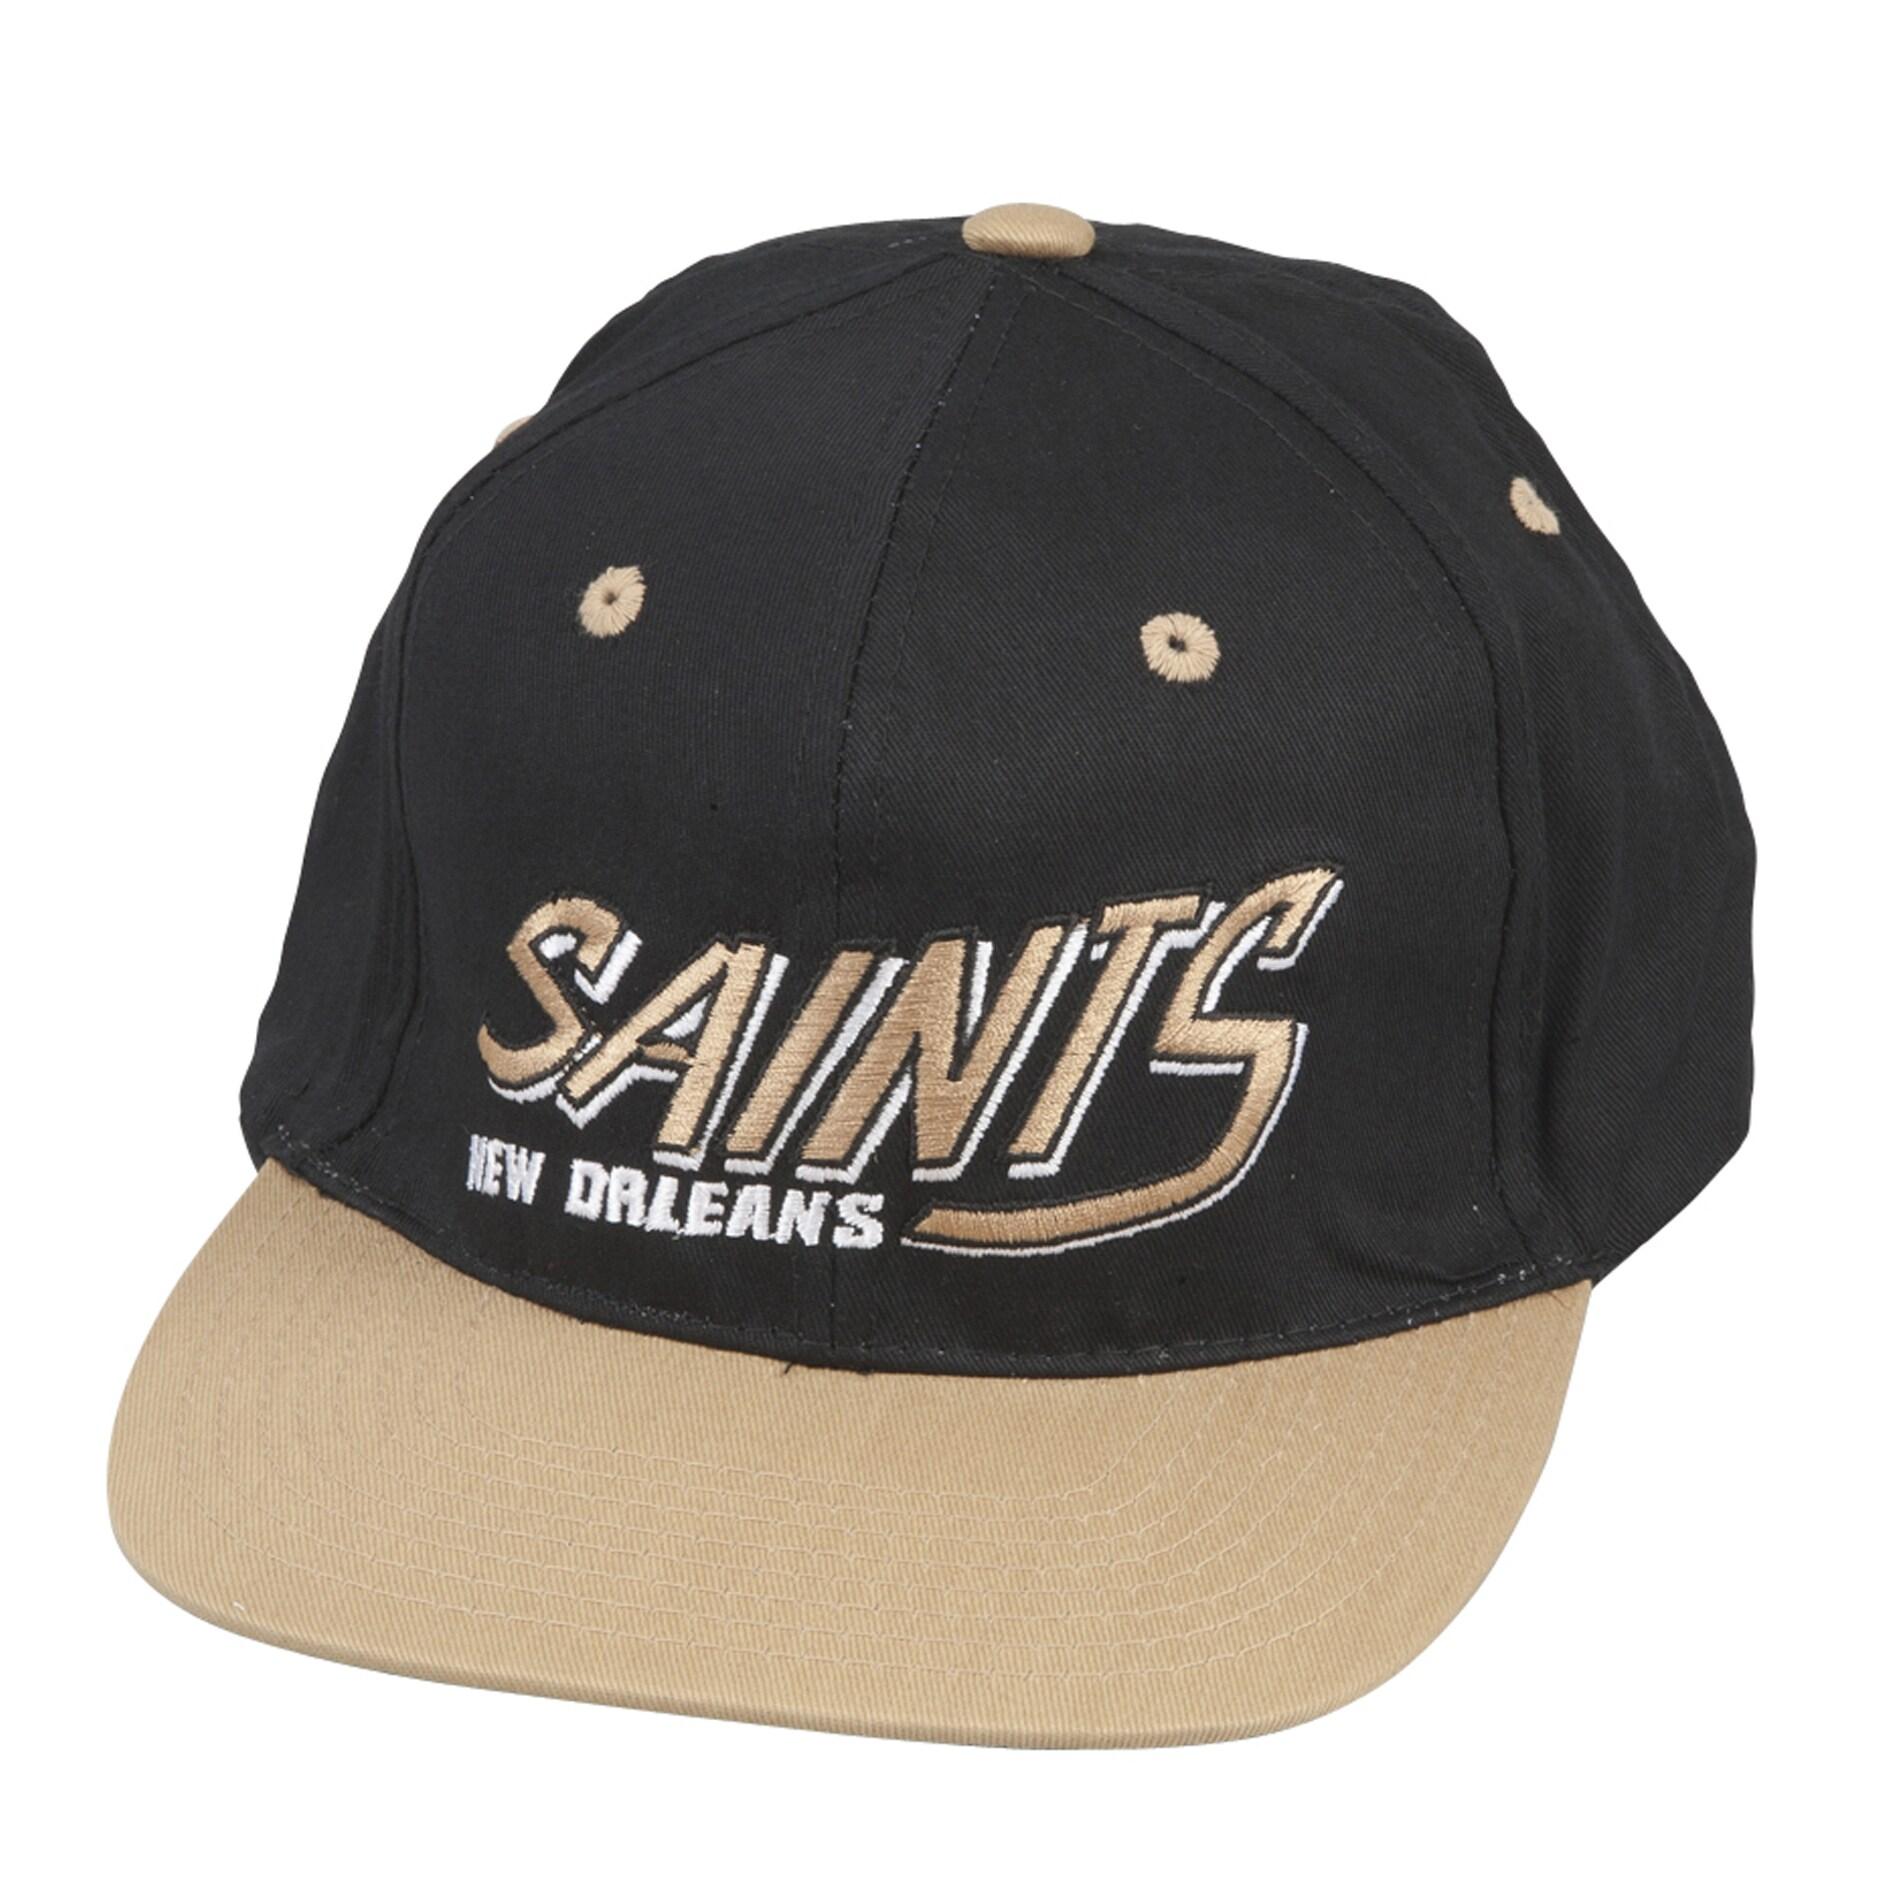 New Orleans Saints Retro NFL Snapback Hat